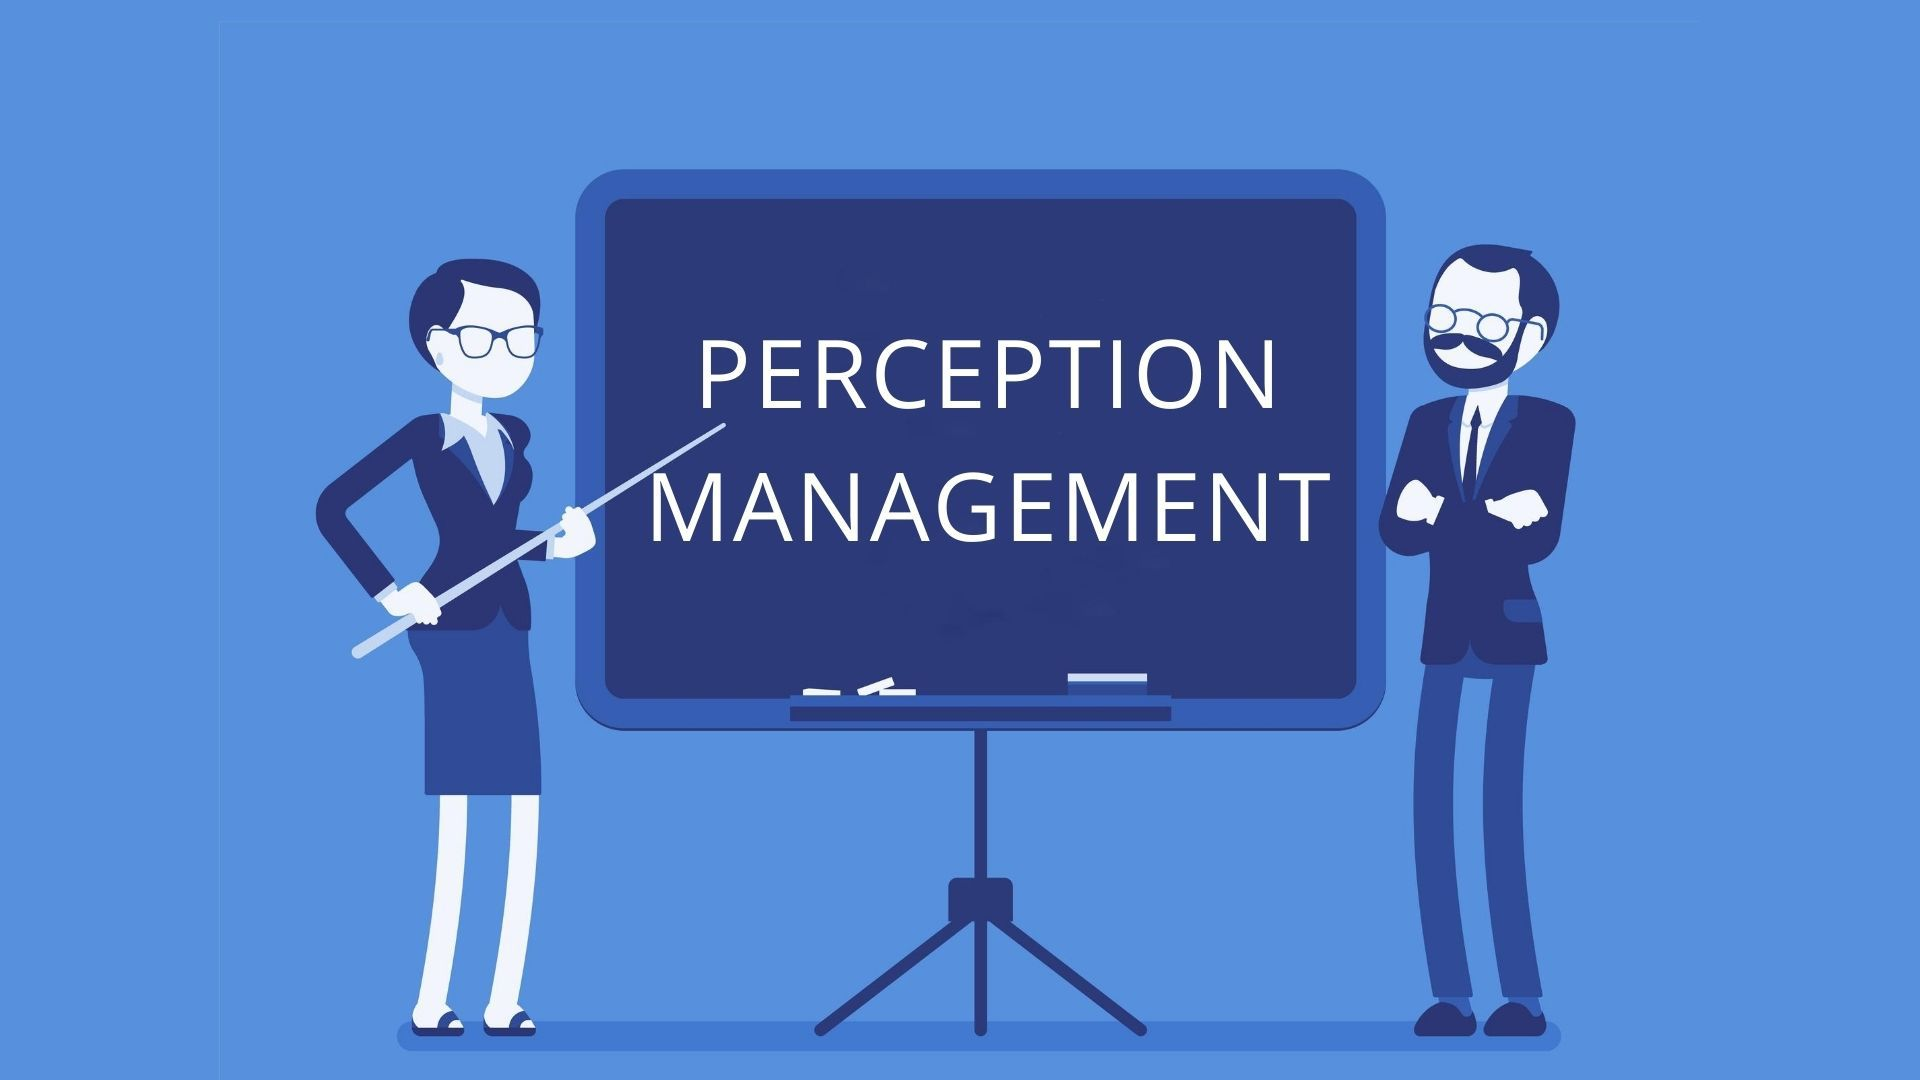 Perception Management